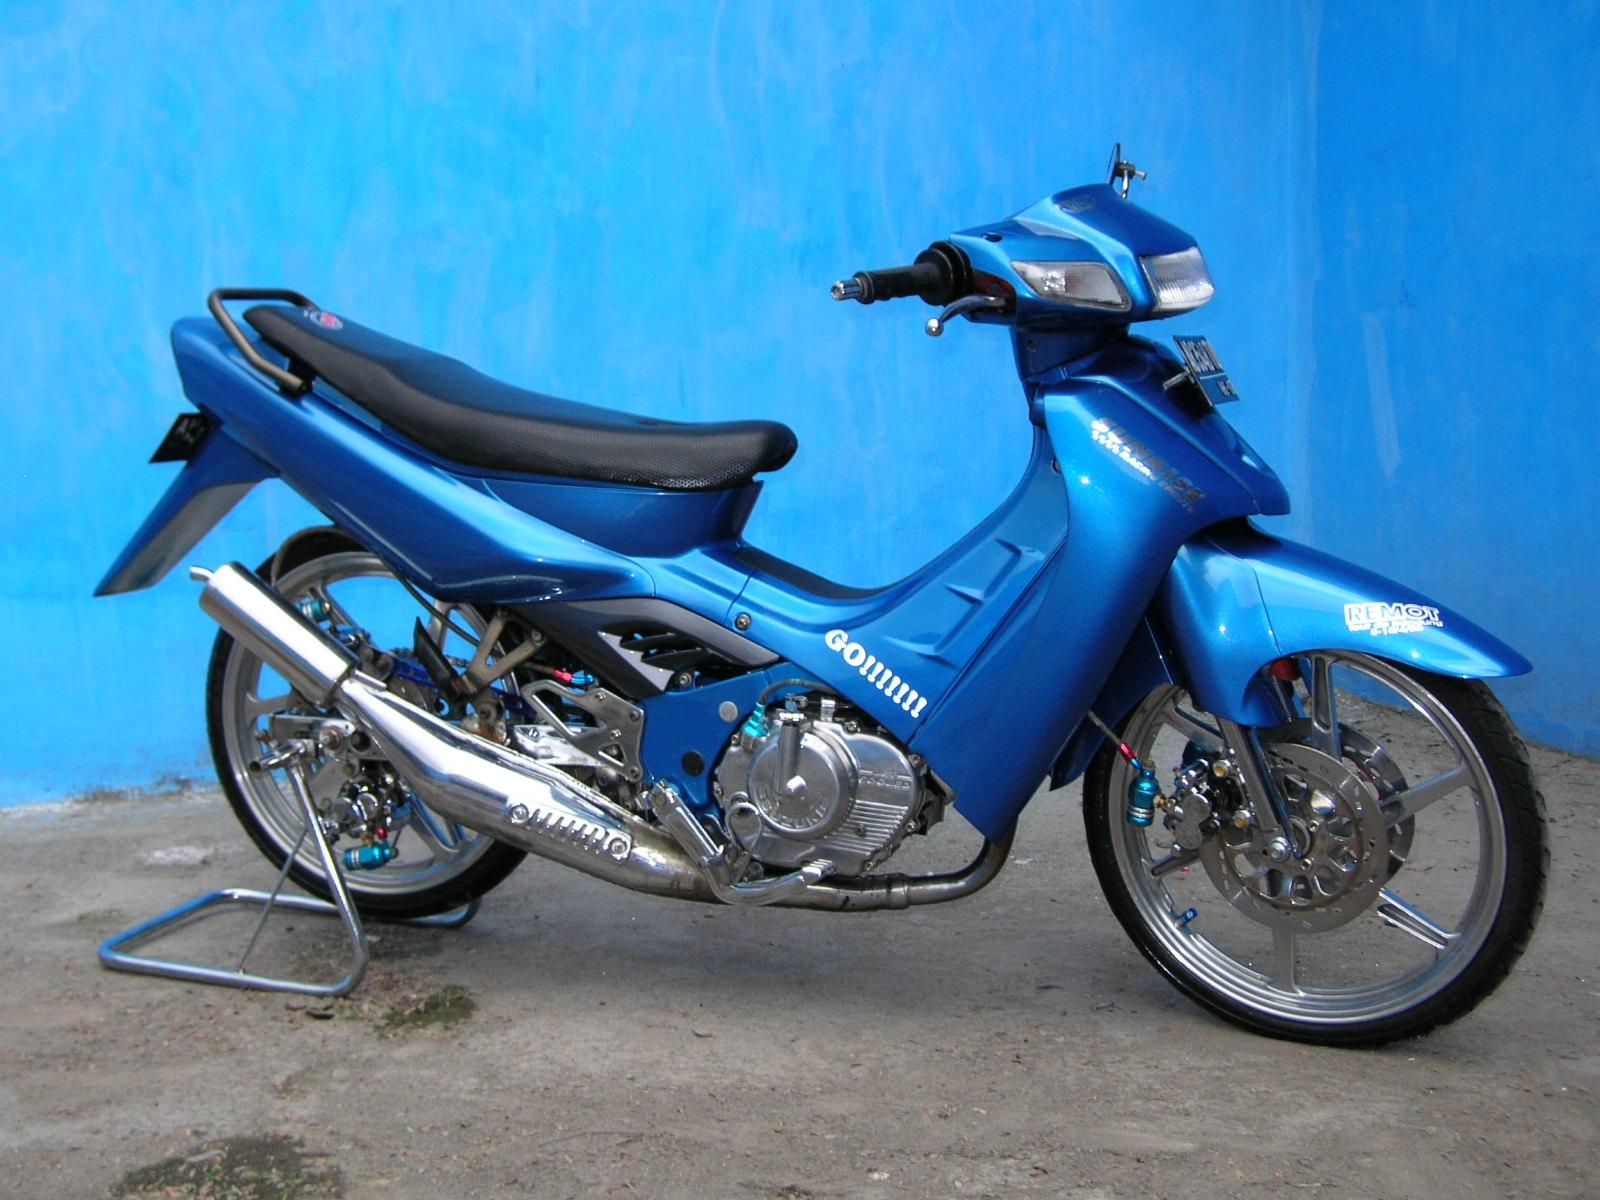 Motor Modifikasi Suzuki Modif Suzuki Satria Blue Color